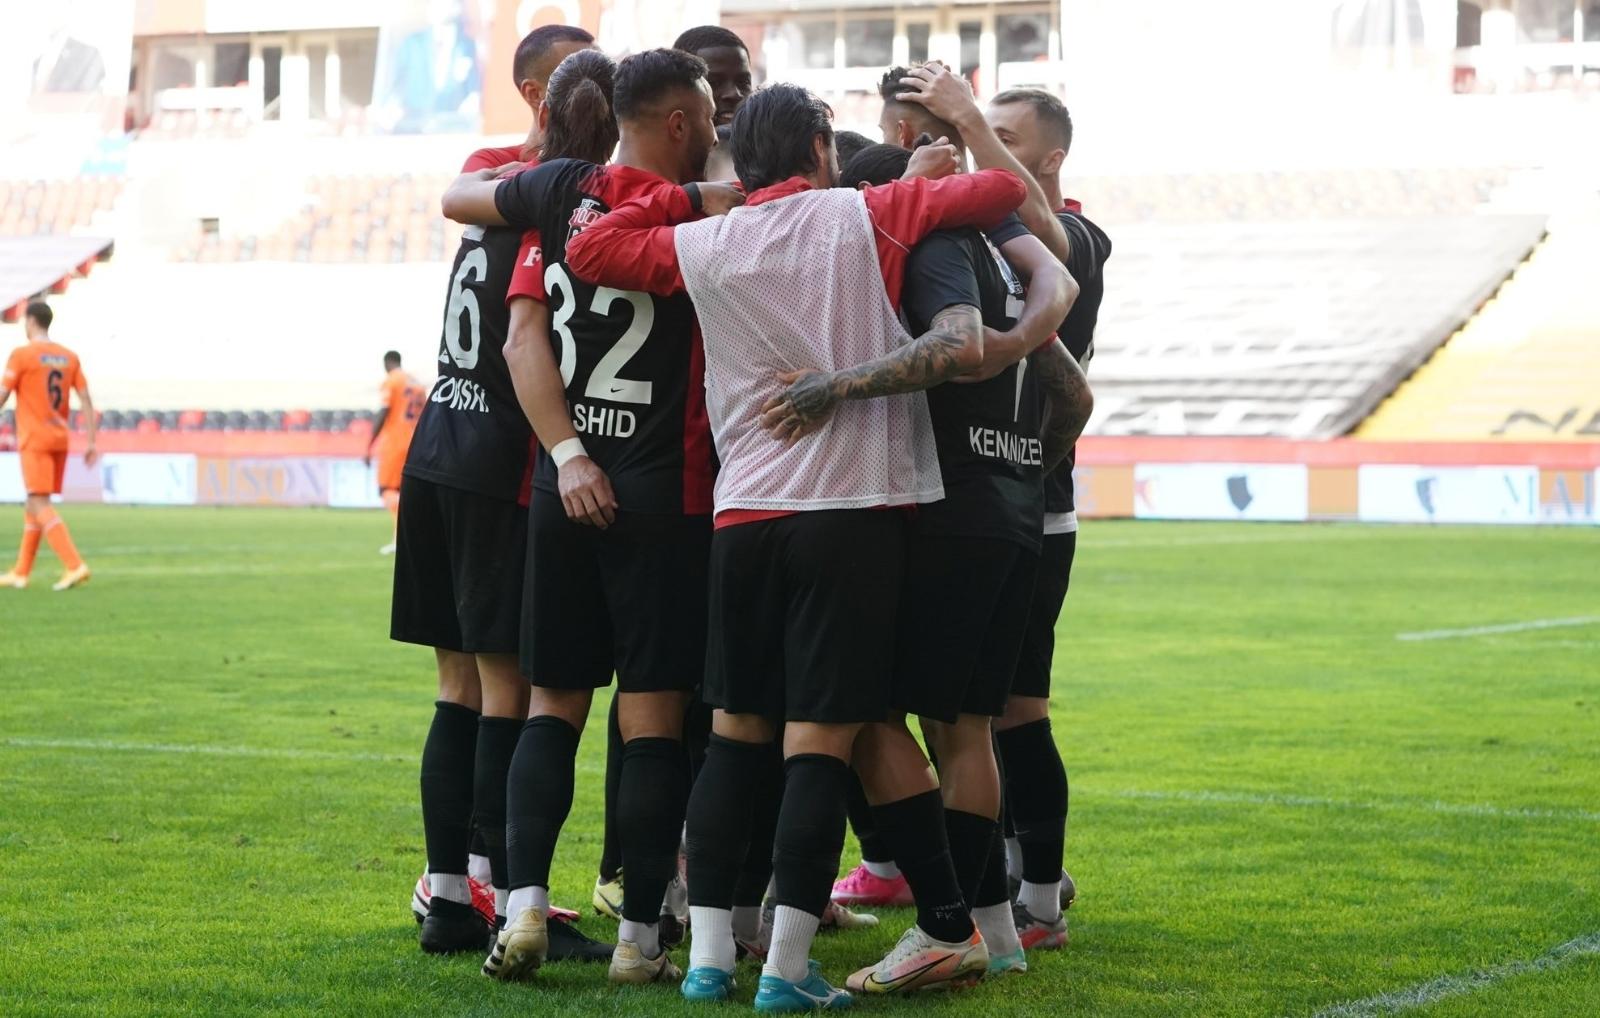 Süper Lig: Gaziantep FK: 2 - Medipol Başakşehir: 0 (Maç sonucu)